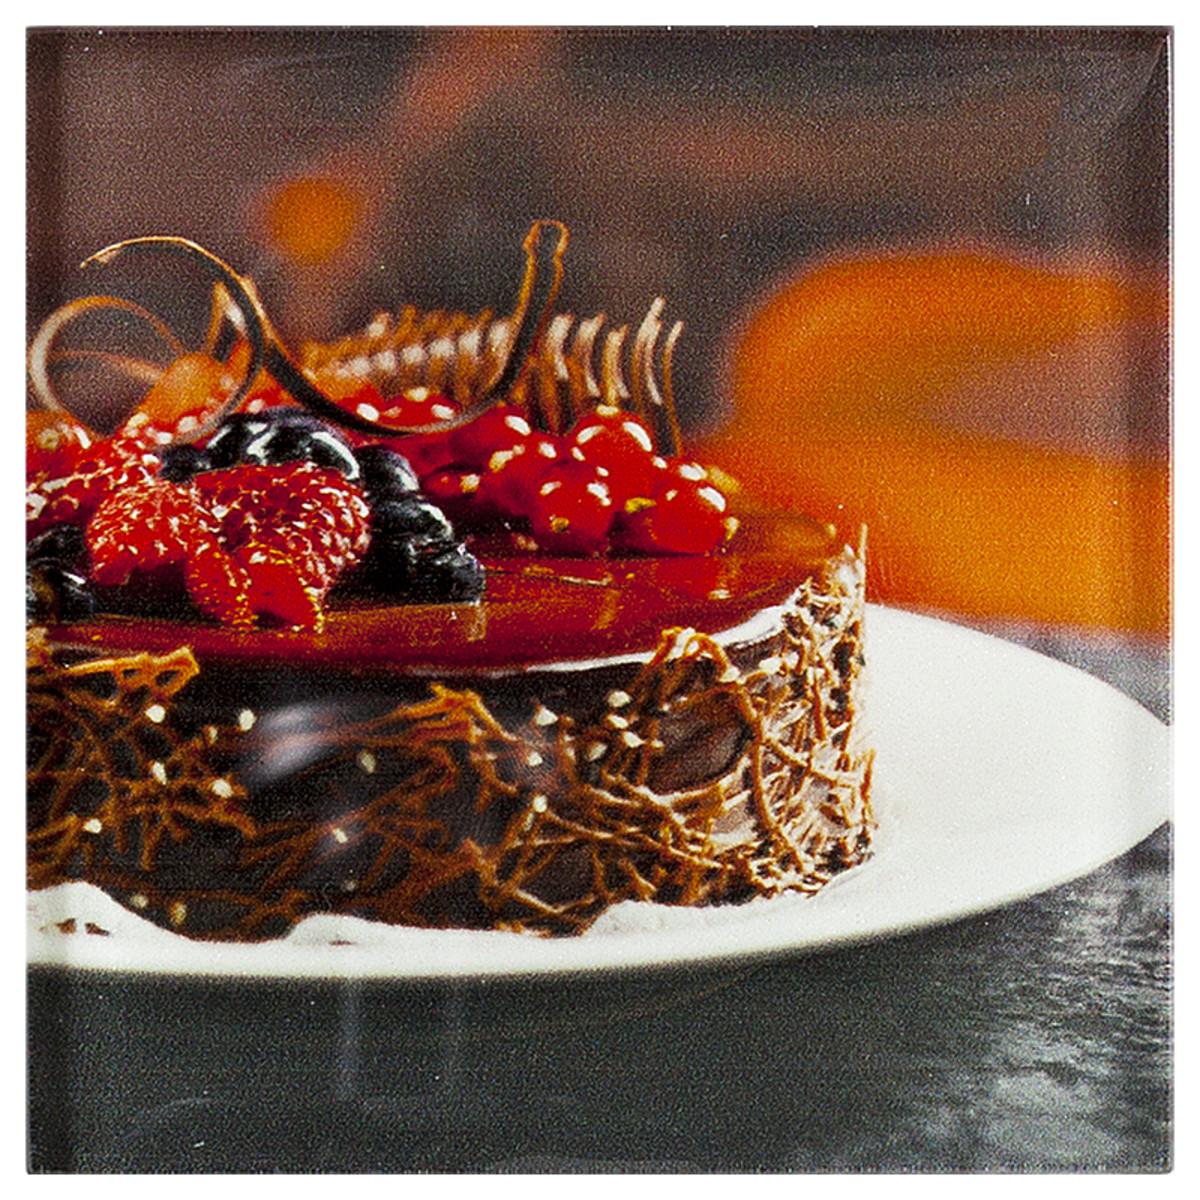 Cake multifruit 10x10 см